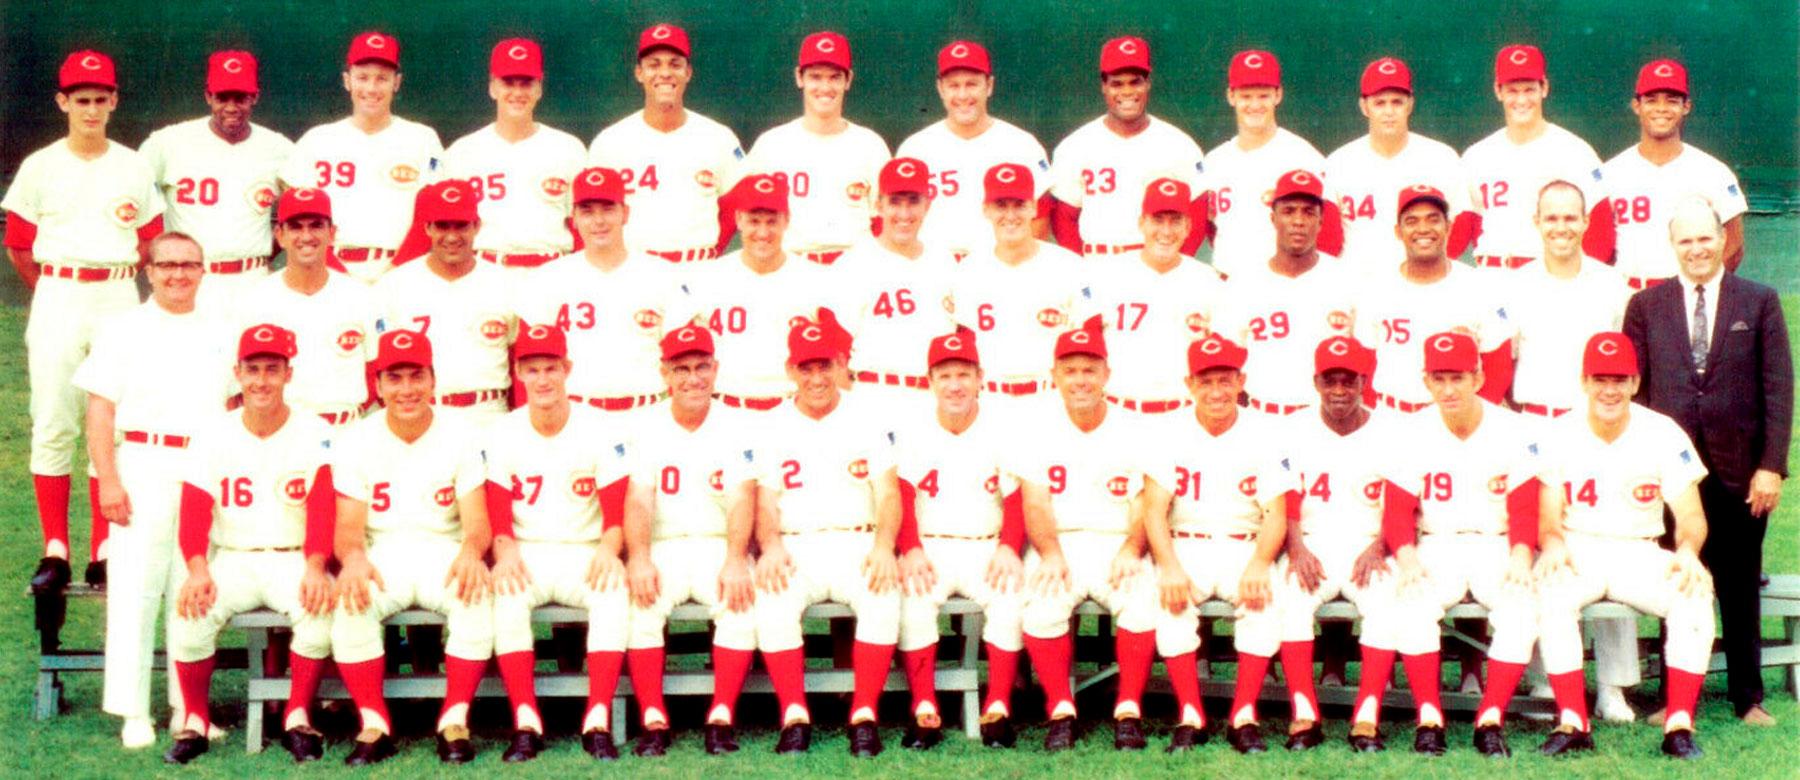 Cincinnati Reds 150 Throwback Uniforms - 1969 Edition - Redleg Nation